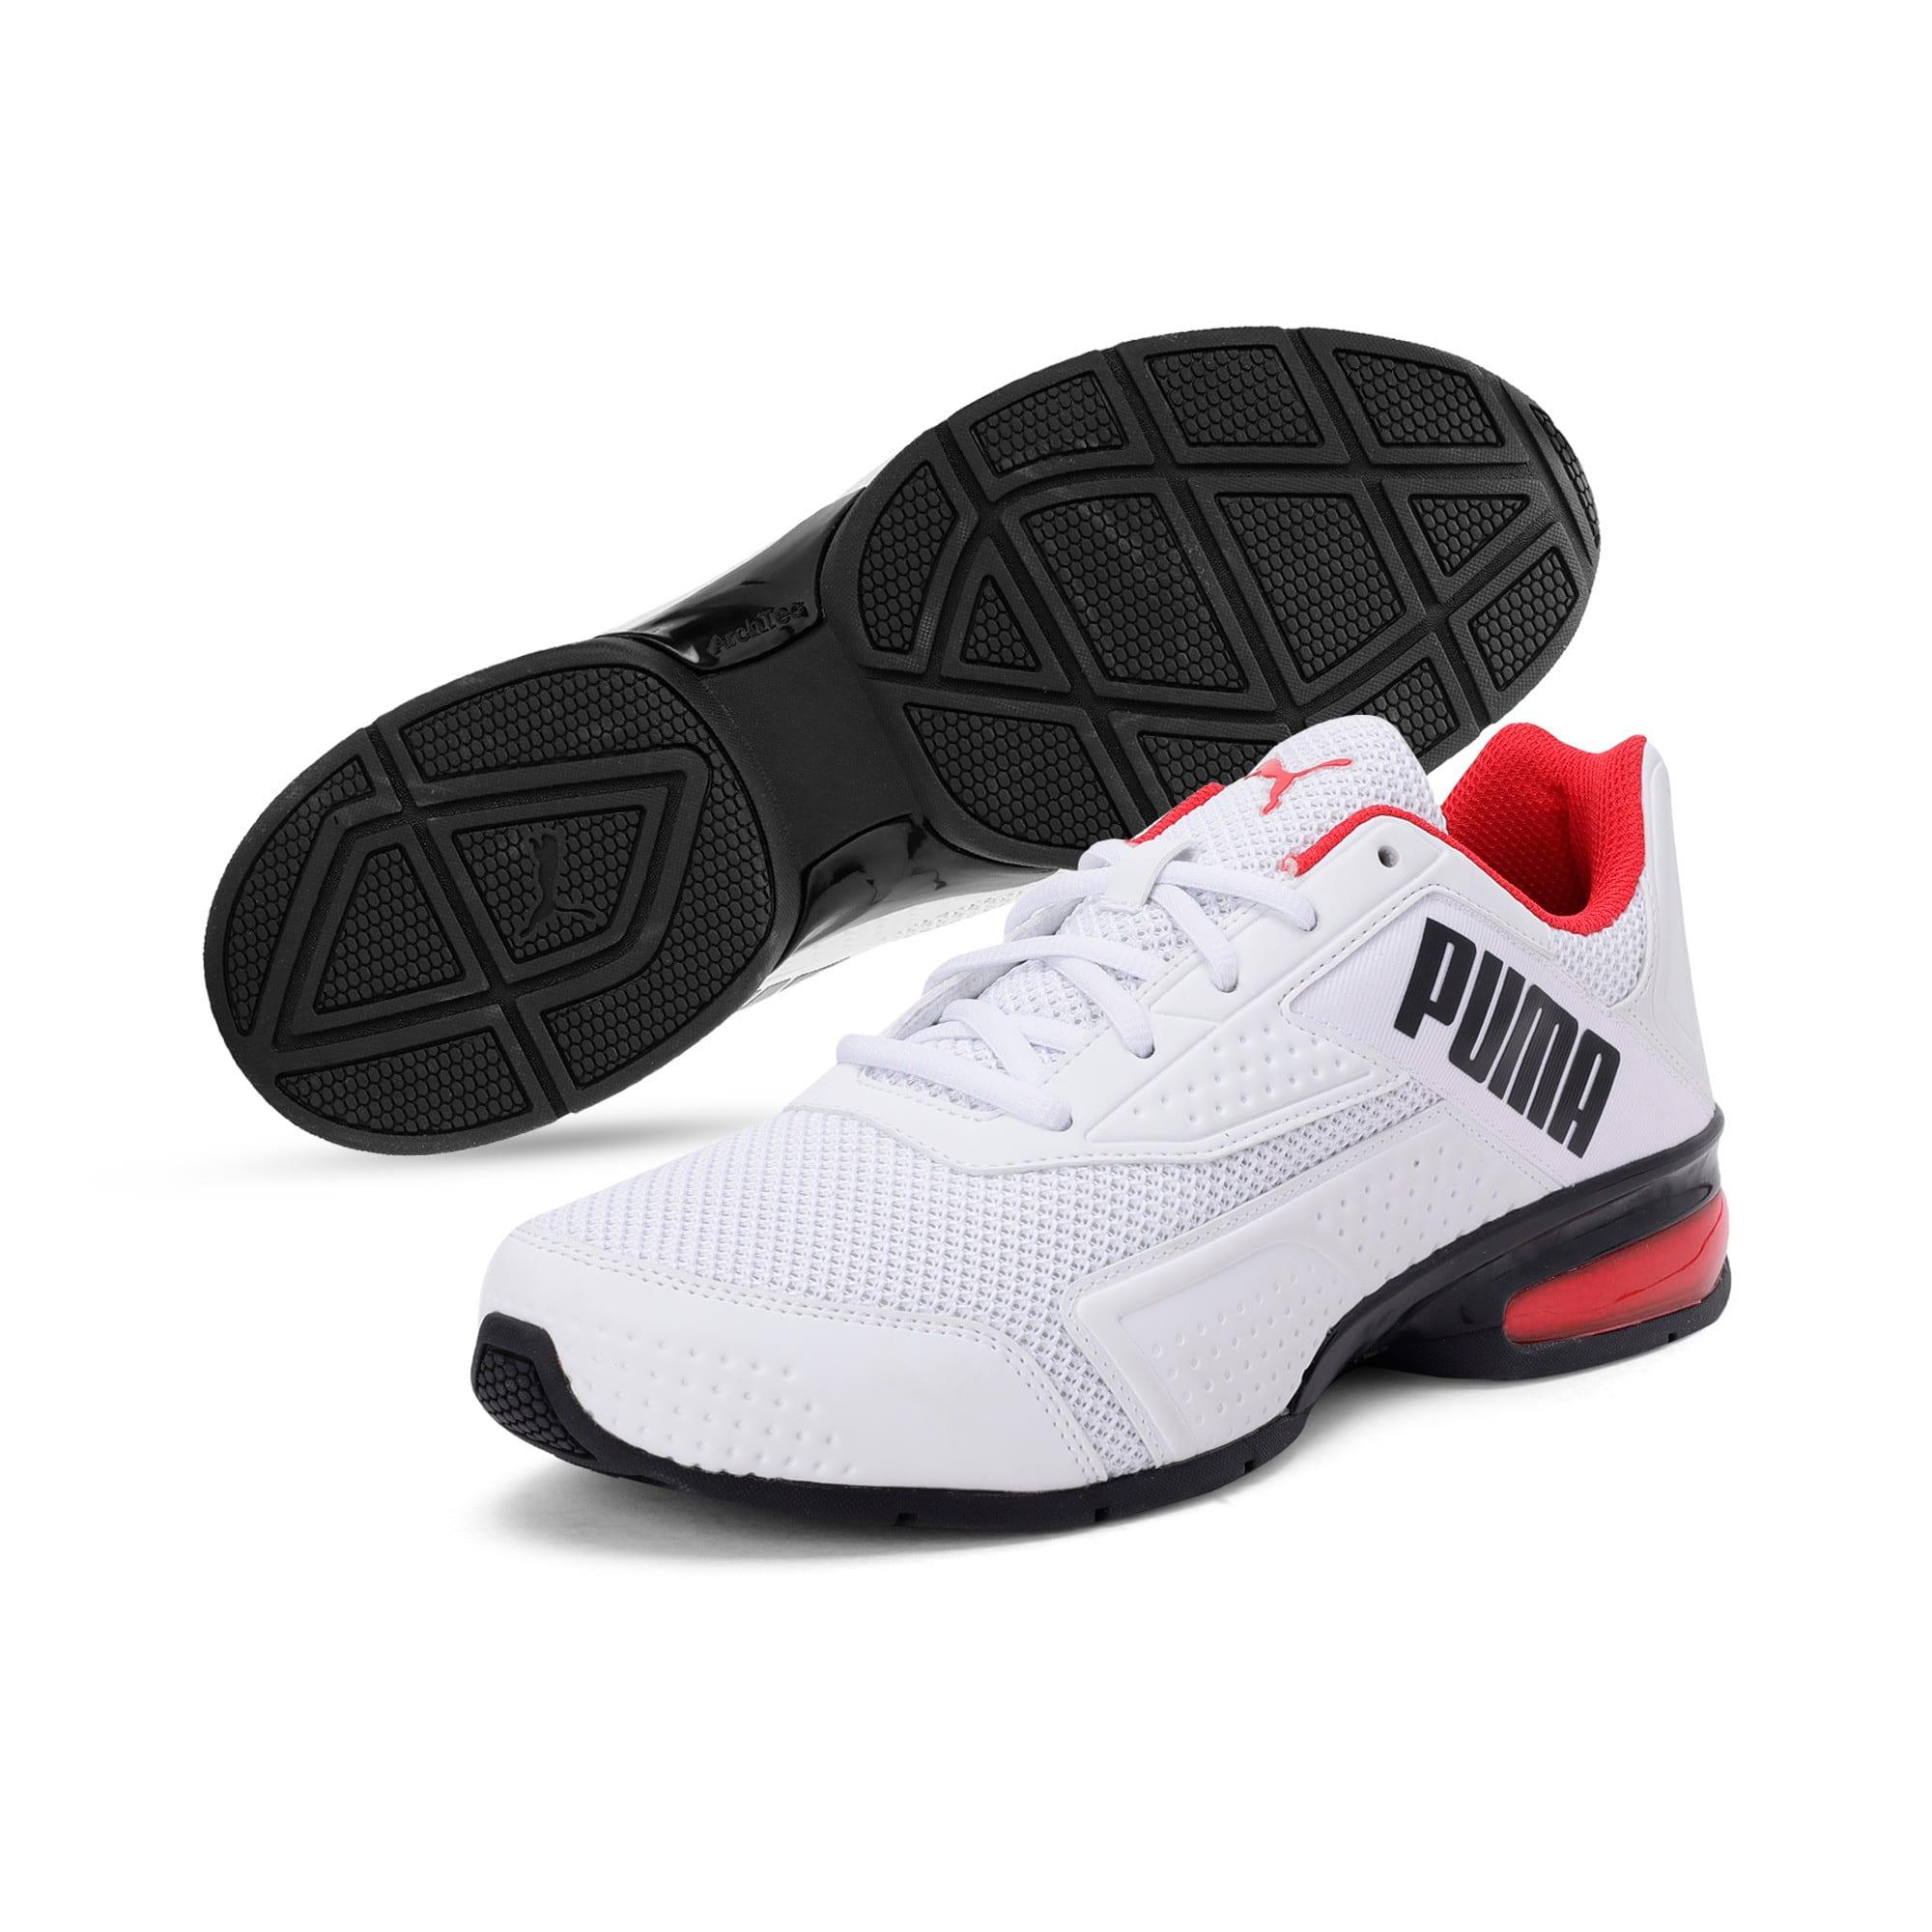 Thumbnail 2 of Leader VT NU Training Shoes, Puma Wht-Hgh Rsk Rd-Pma Blk, medium-IND